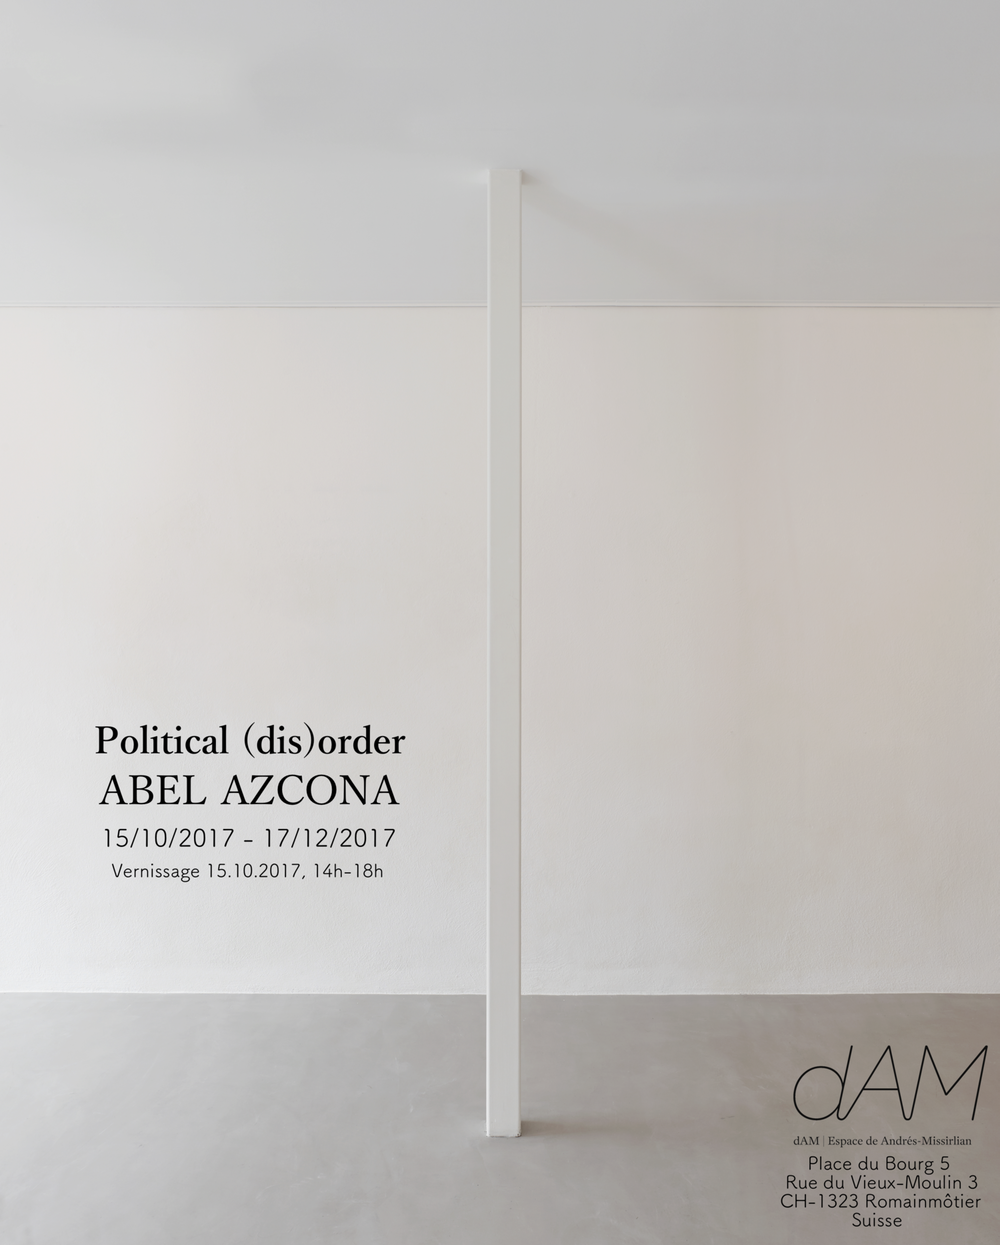 Cartel de la exposición Political (dis)order de  Abel Azcona  en  dAM .